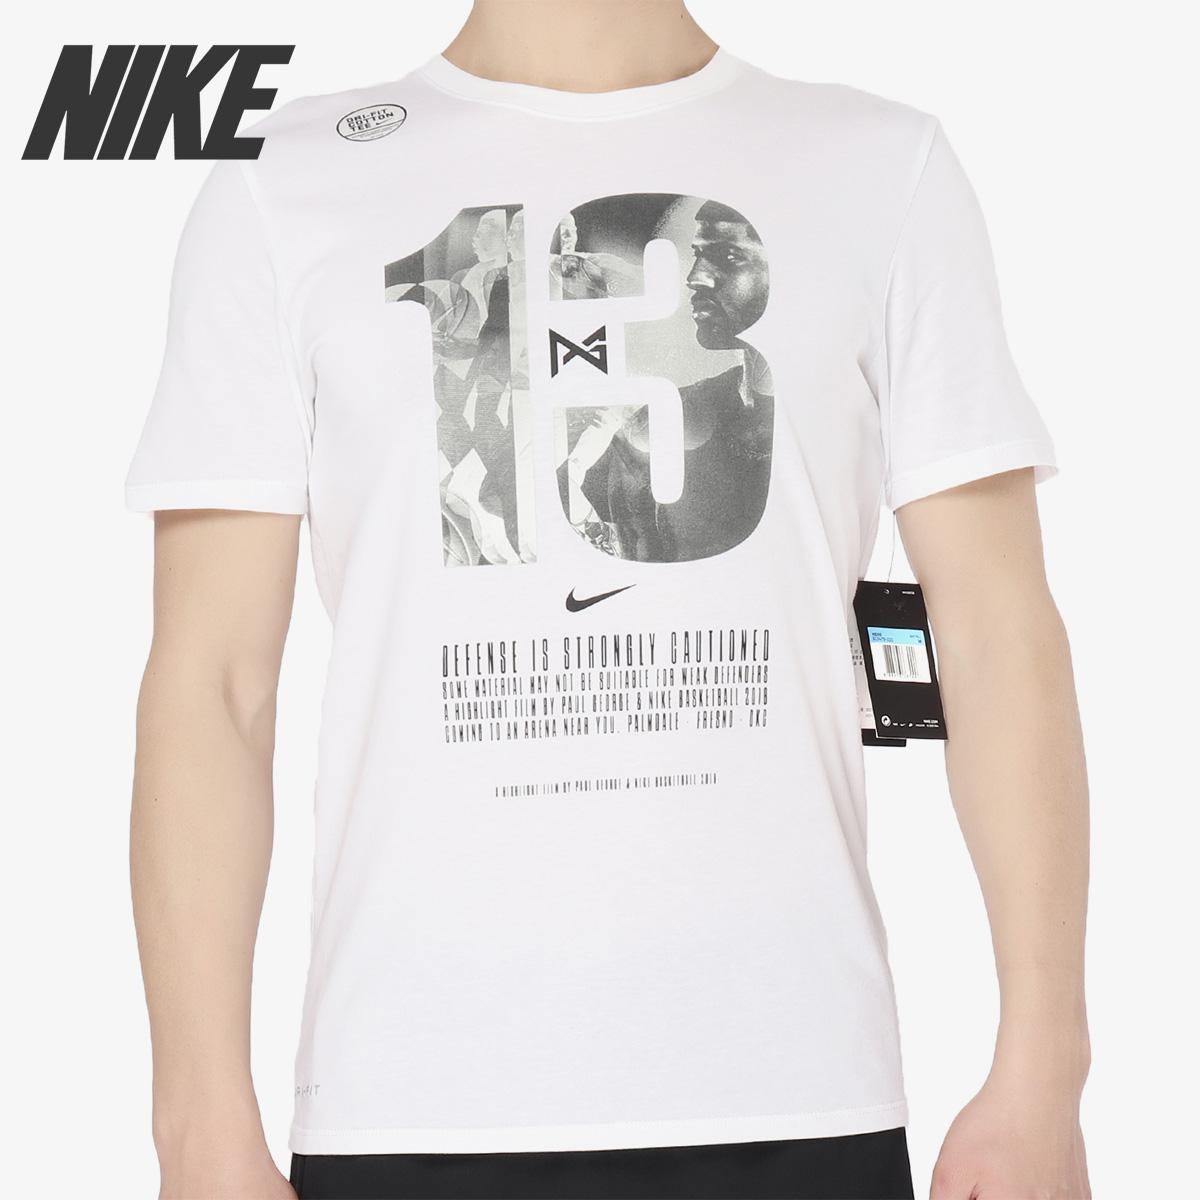 Nike/耐克正品2019新款 Dri-FIT PG 13保罗乔治运动短袖T恤9限时秒杀